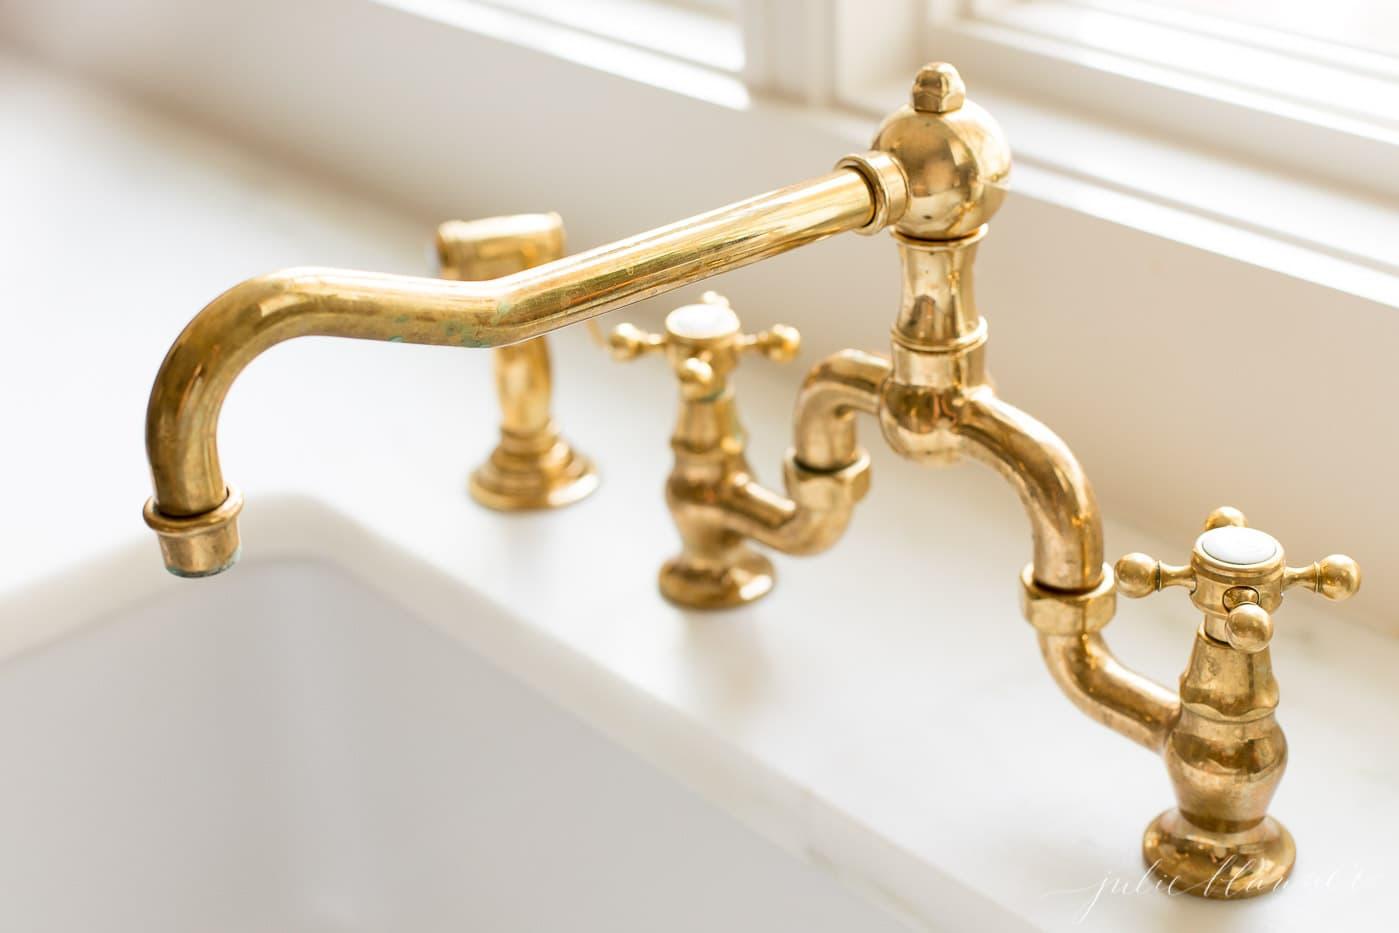 A brass bridge faucet over a farmhouse sink.